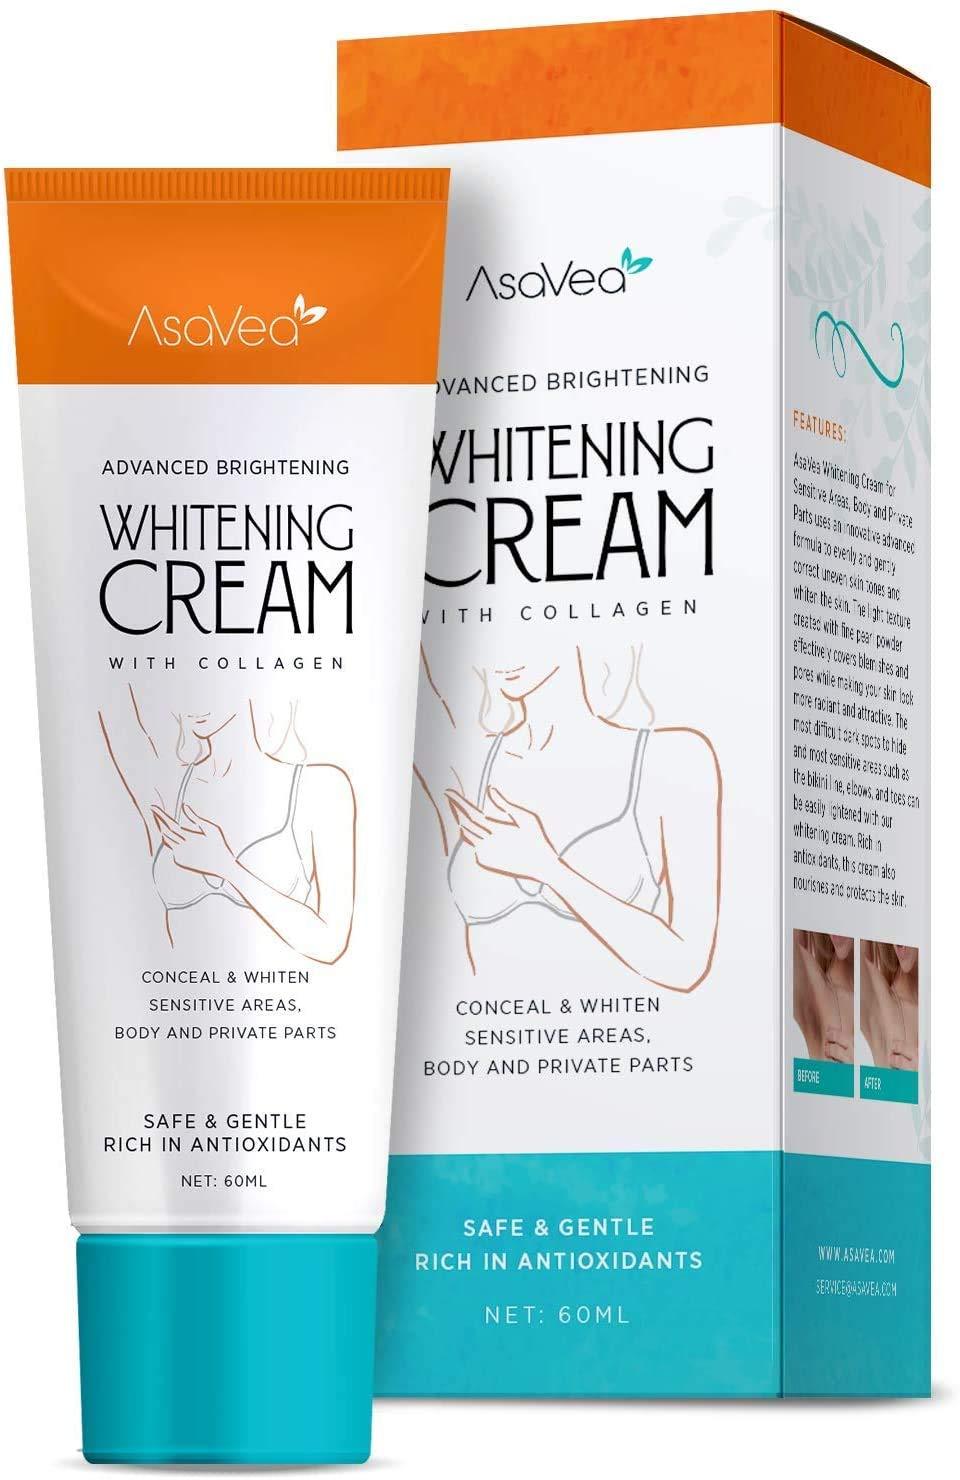 AsaVea Whitening Cream for women, Natural Underarm Cream,Armpit Brightening Cream, Between Legs - with Collagen, Armpit Lighting & Bikini Intimate Bleaching, Crotch & Nipple Whitening Cream